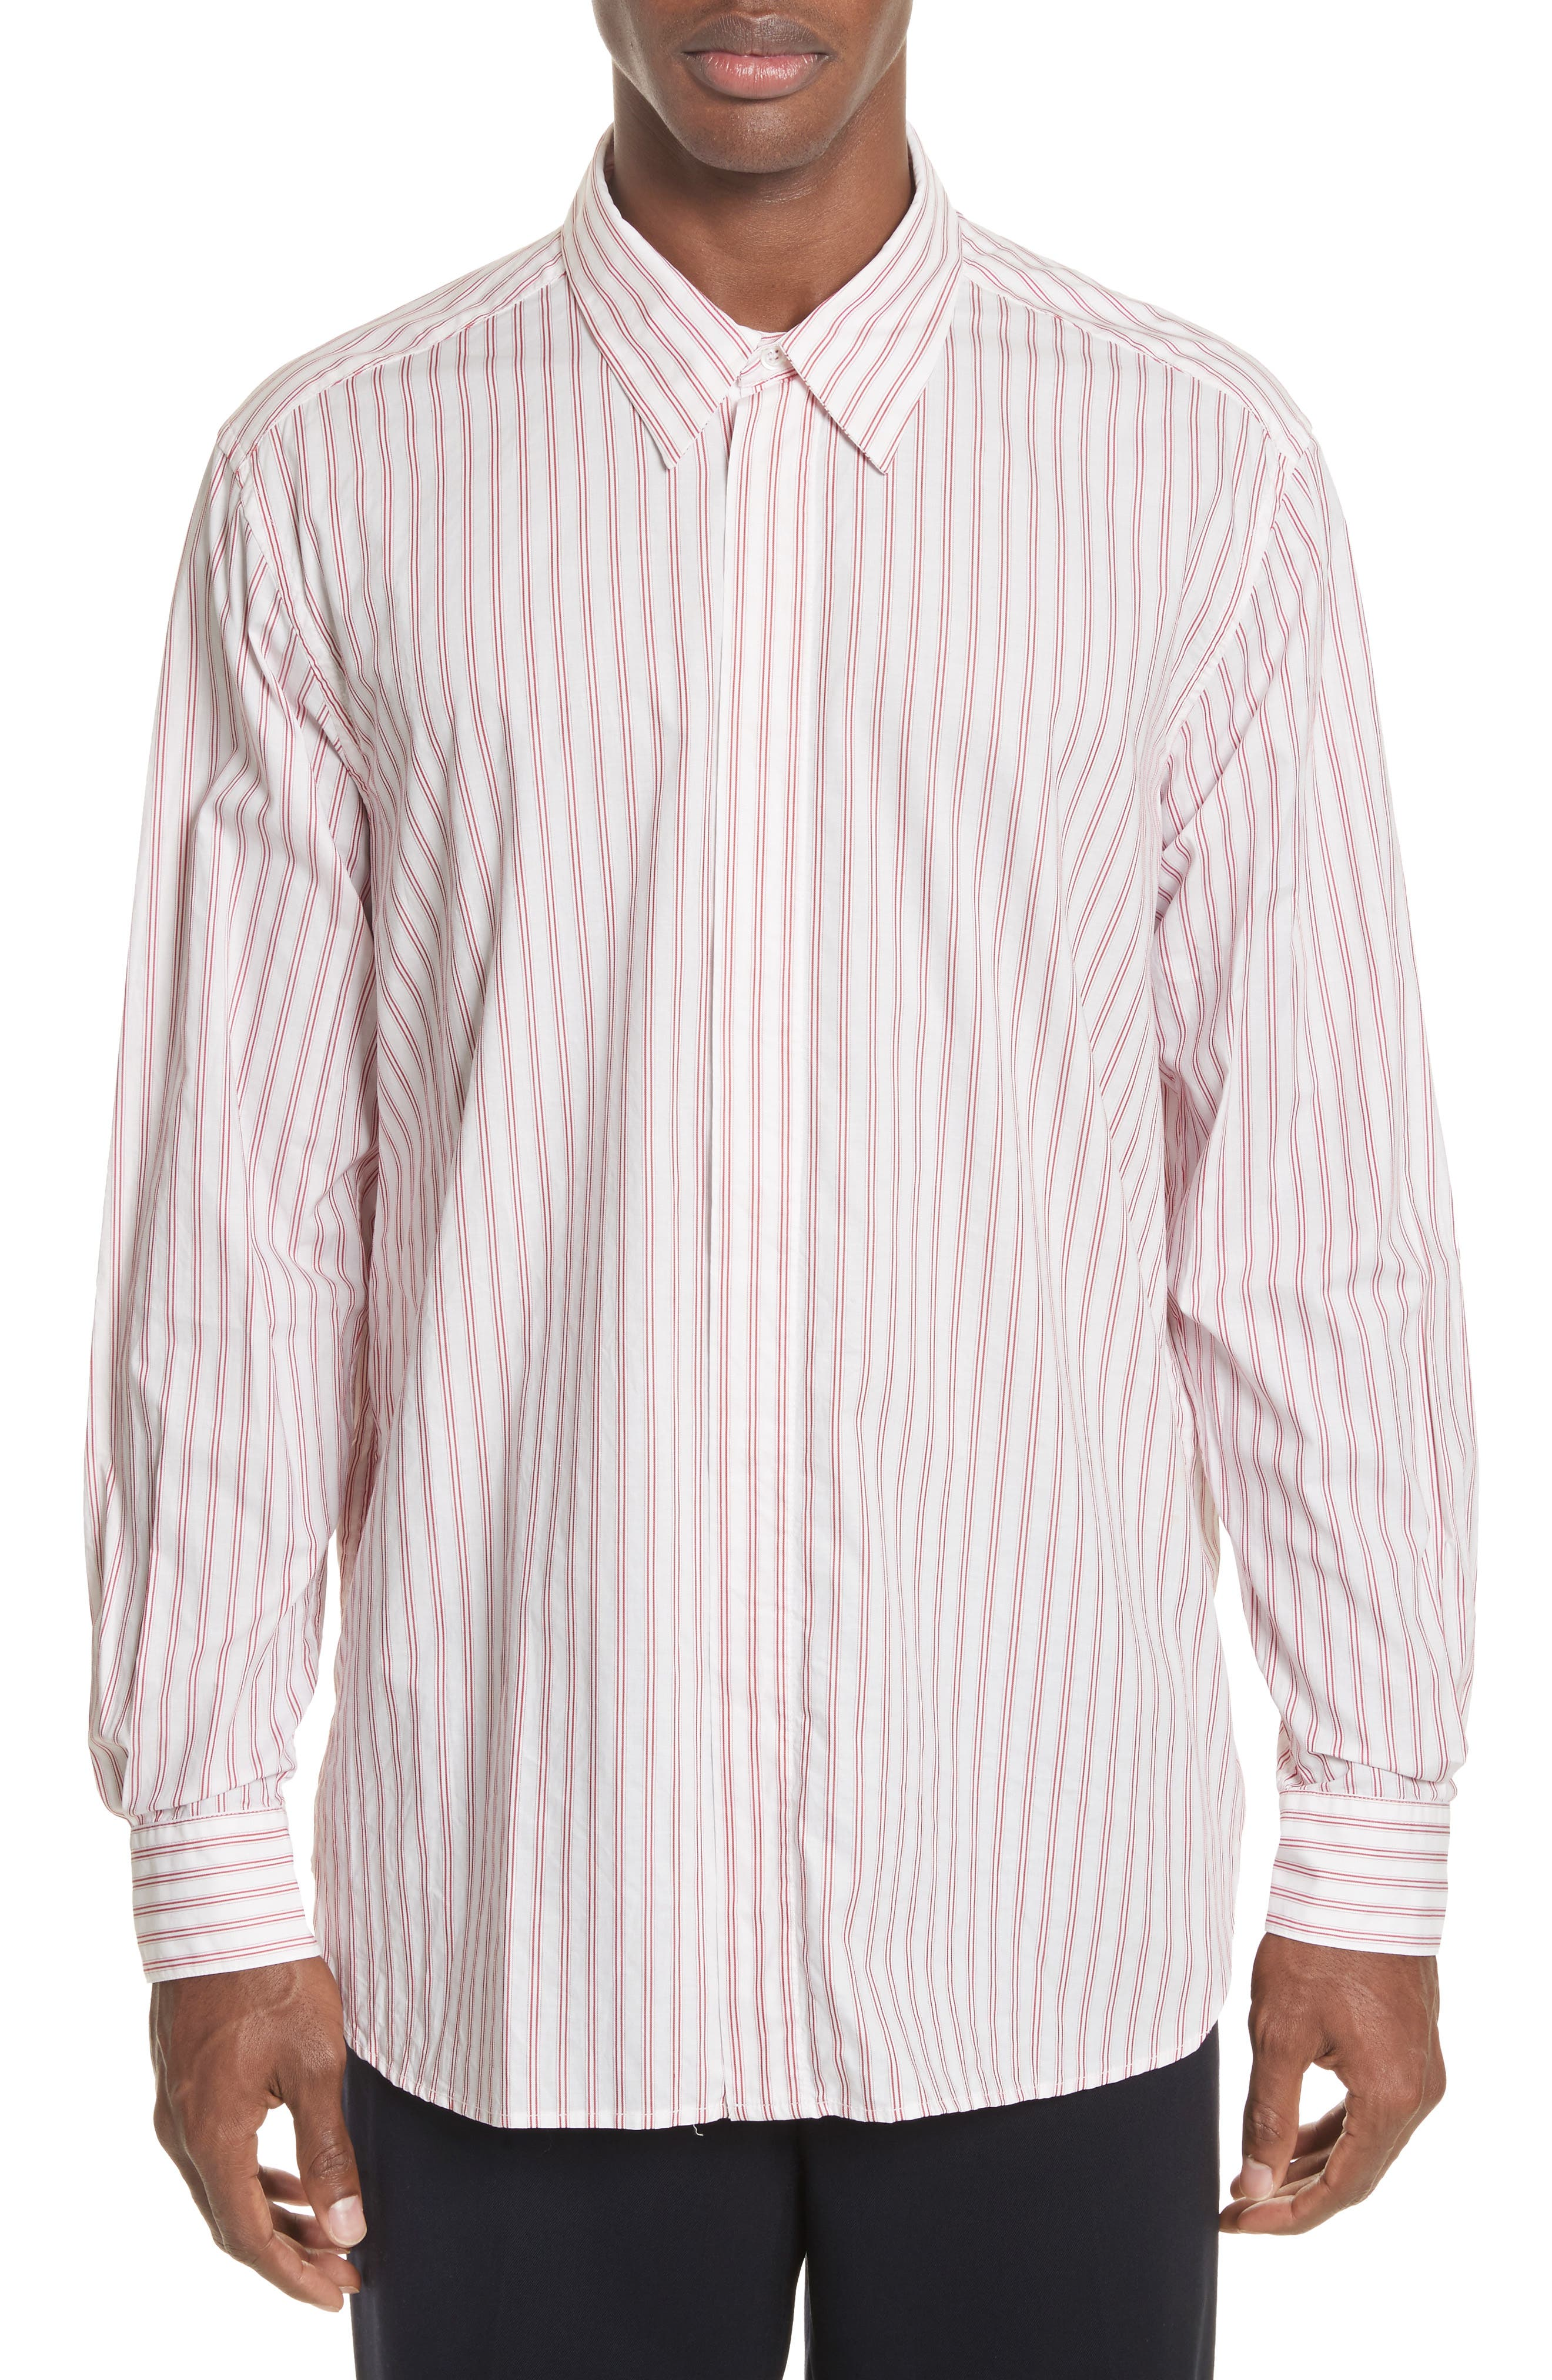 Aega Striped Sport Shirt,                             Main thumbnail 1, color,                             Unico